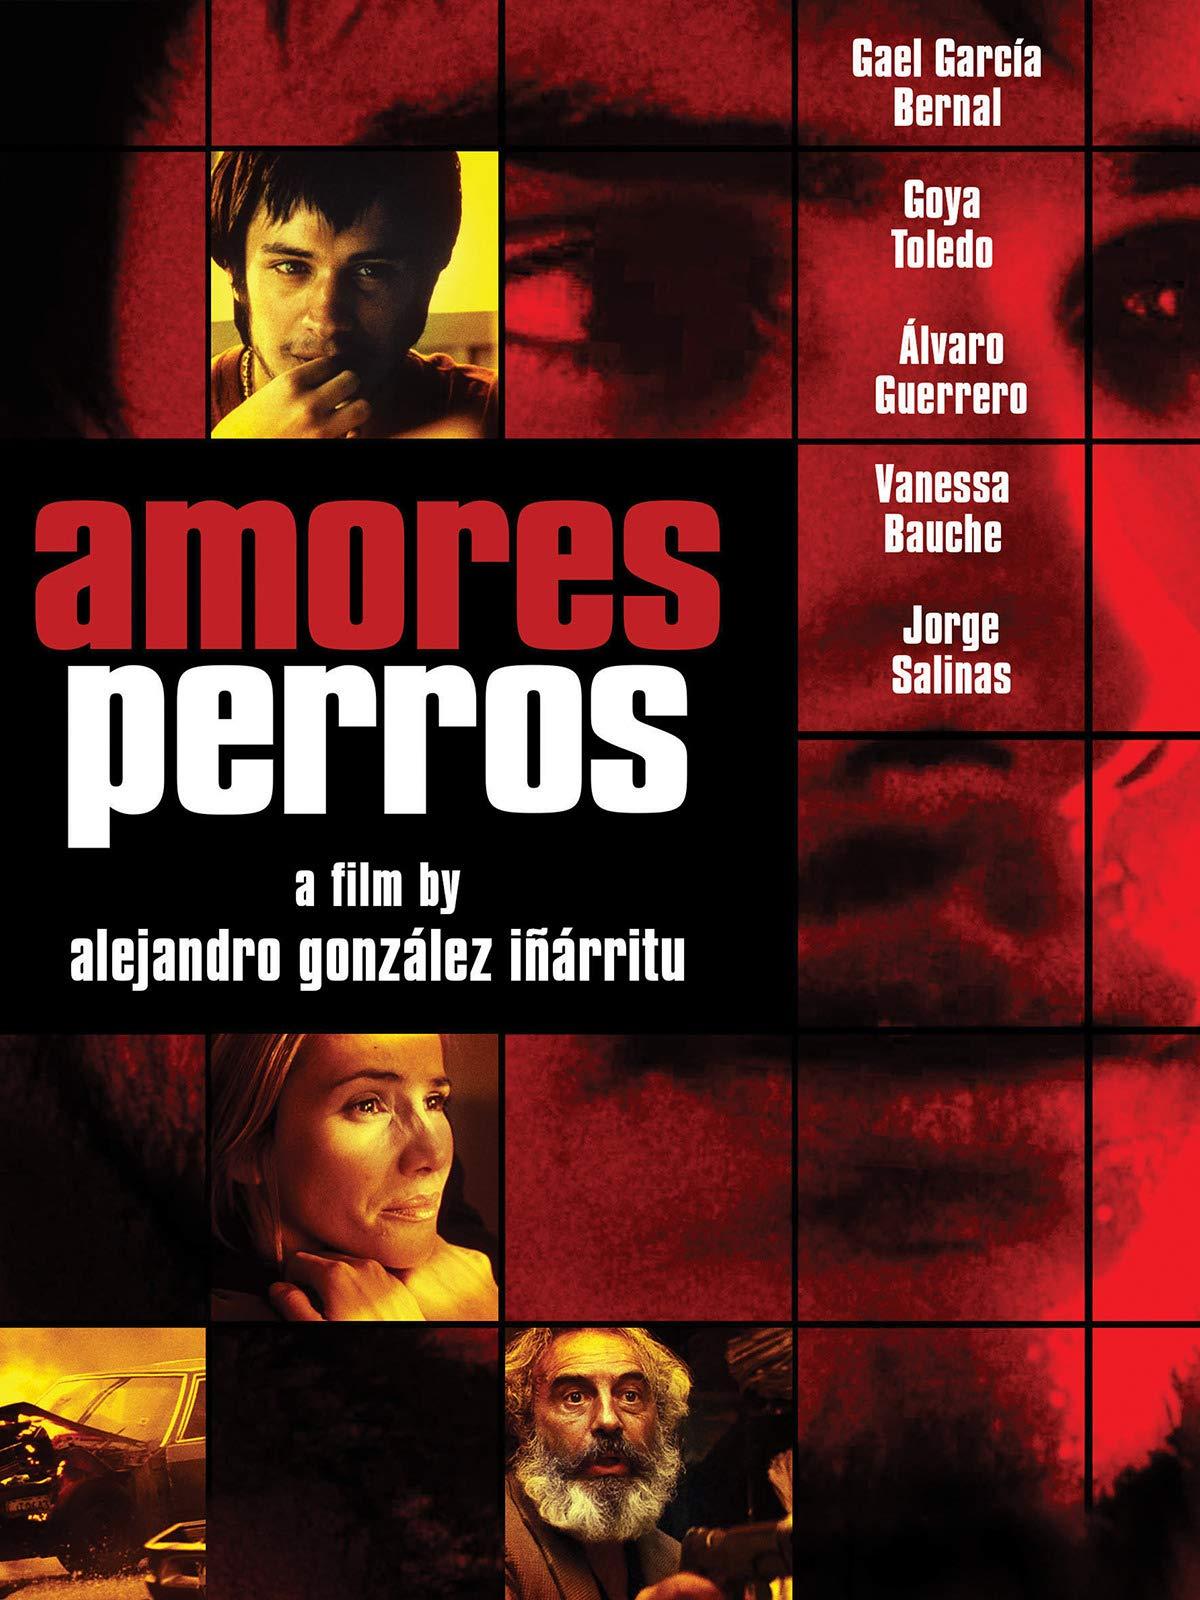 $4.99 VUDU 4K UHD digital movie film THE OMEN, EVIL DEAD 1&2, and AMORES PERROS - top 250 IMDb - Sixth Sense, Poltergeist in HD